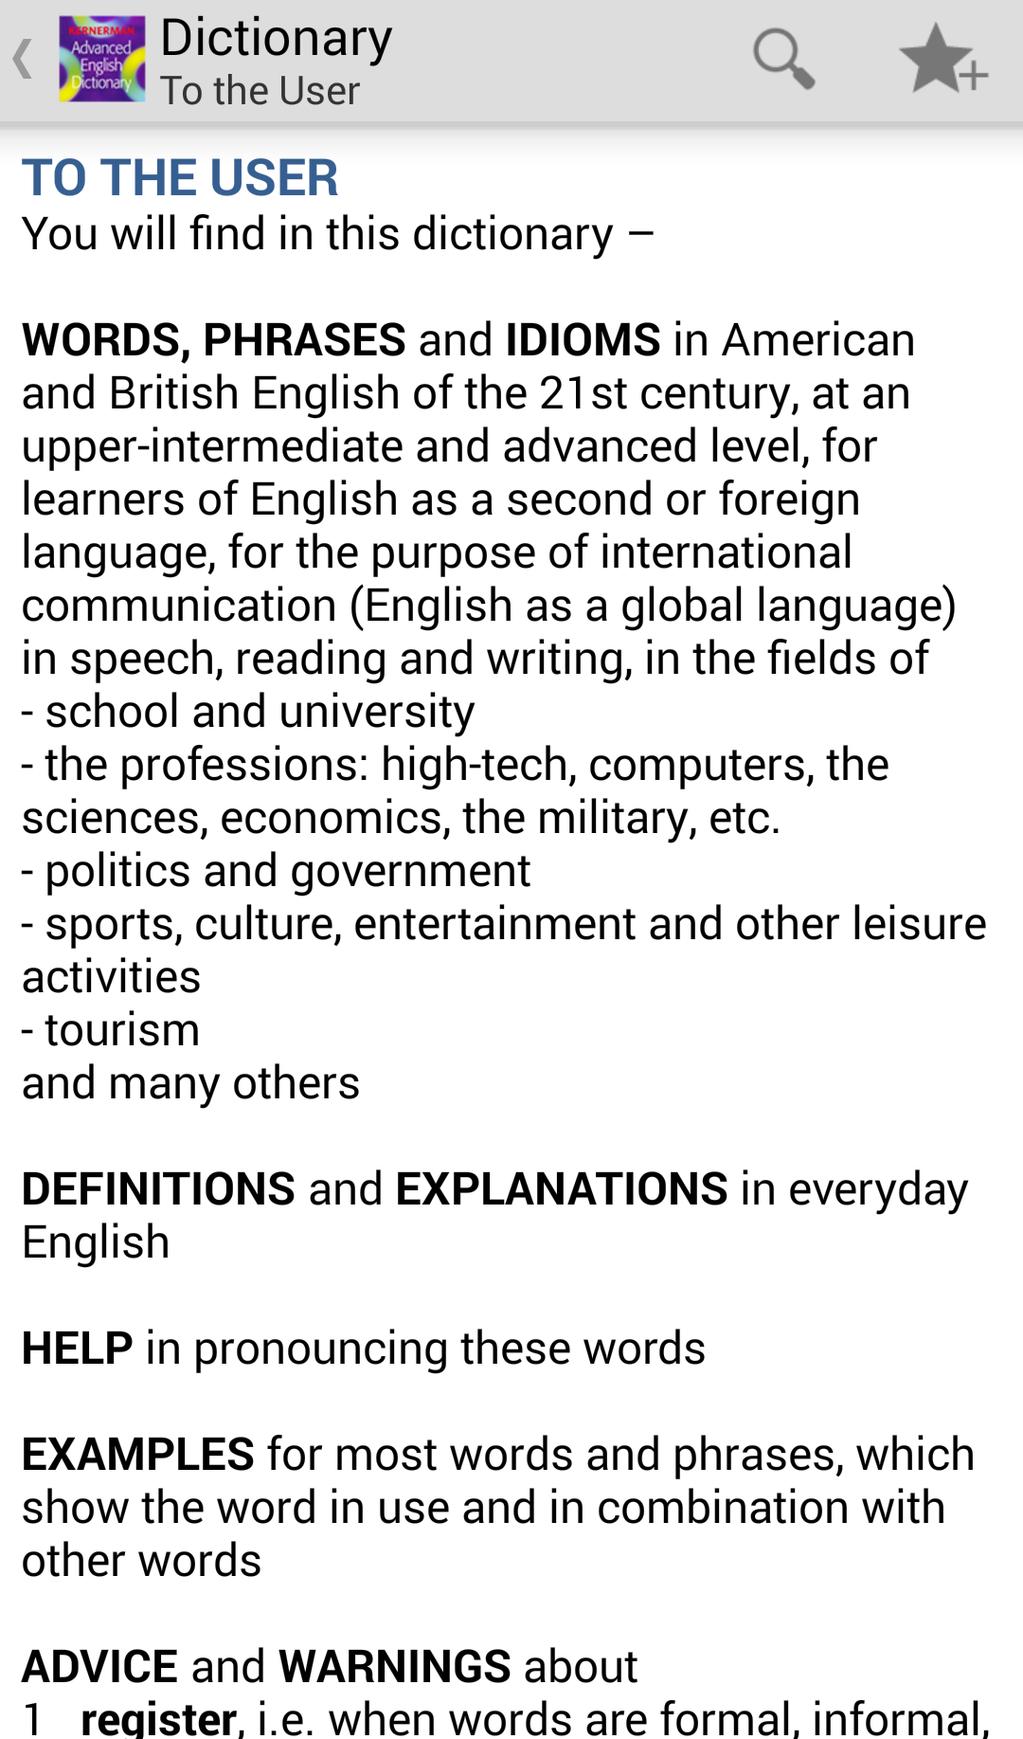 Kernerman Advanced English Dictionary Screenshot